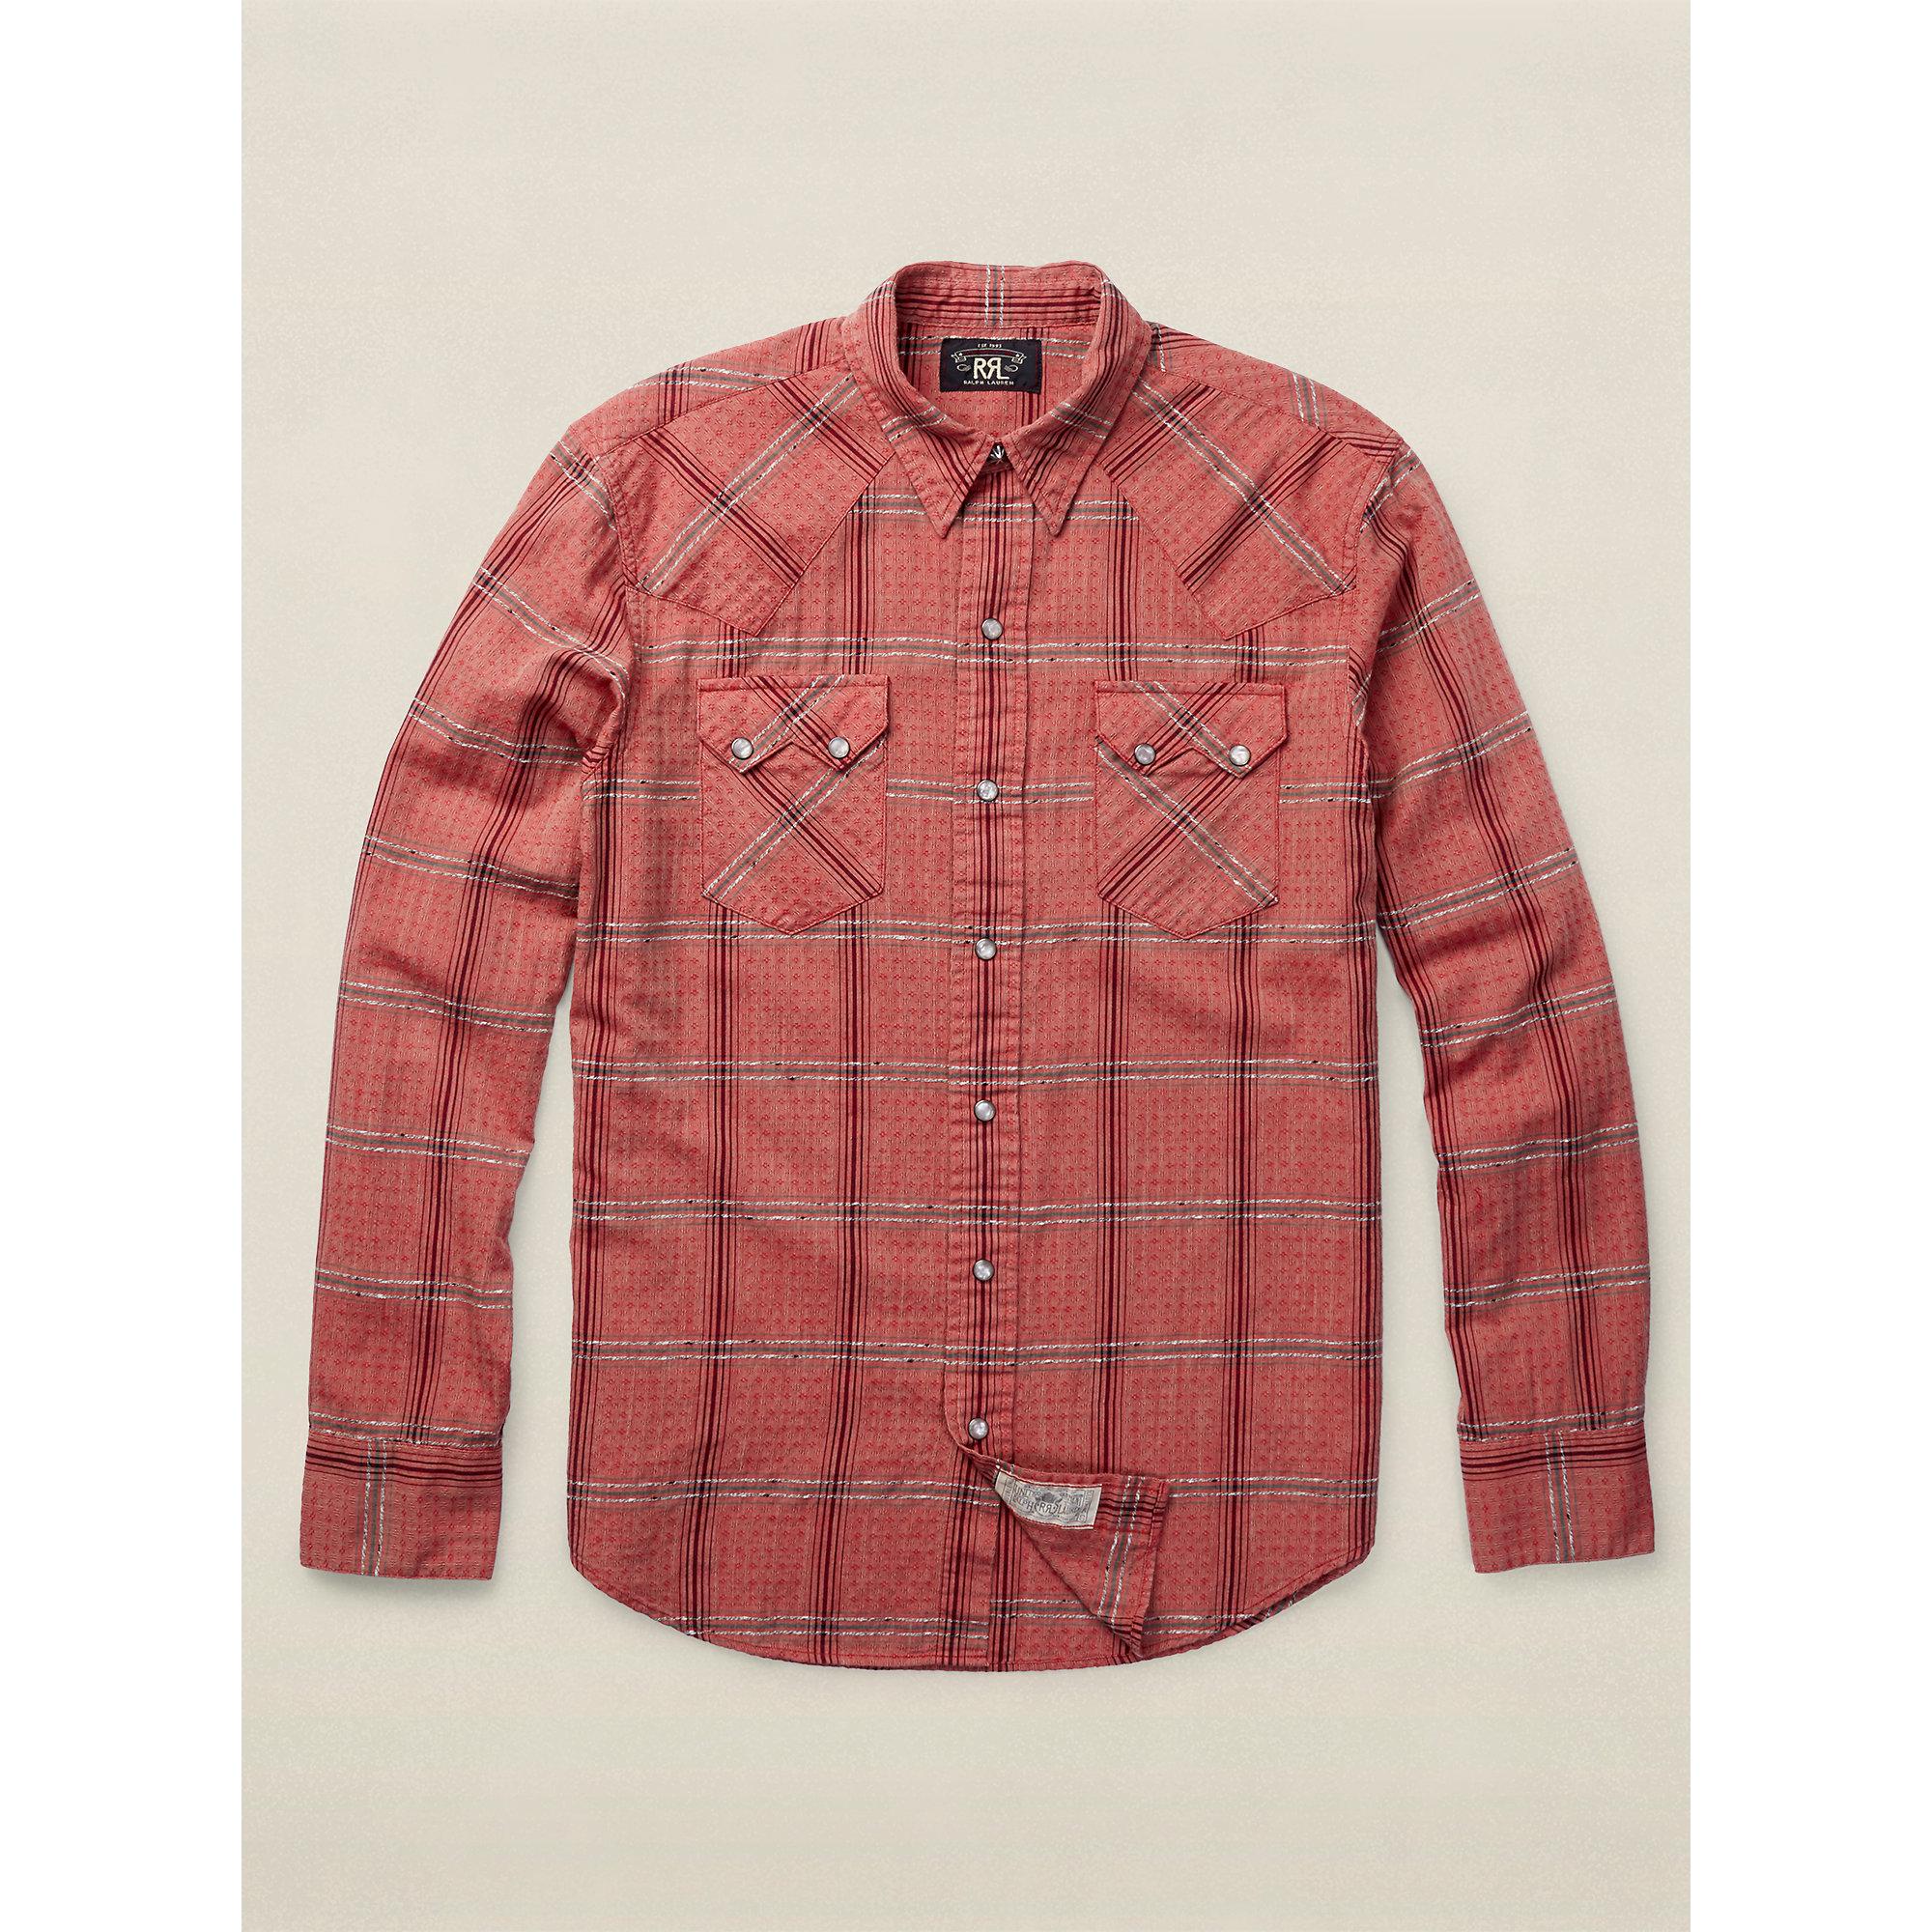 Lyst Rrl Dobby Western Shirt In Red For Men